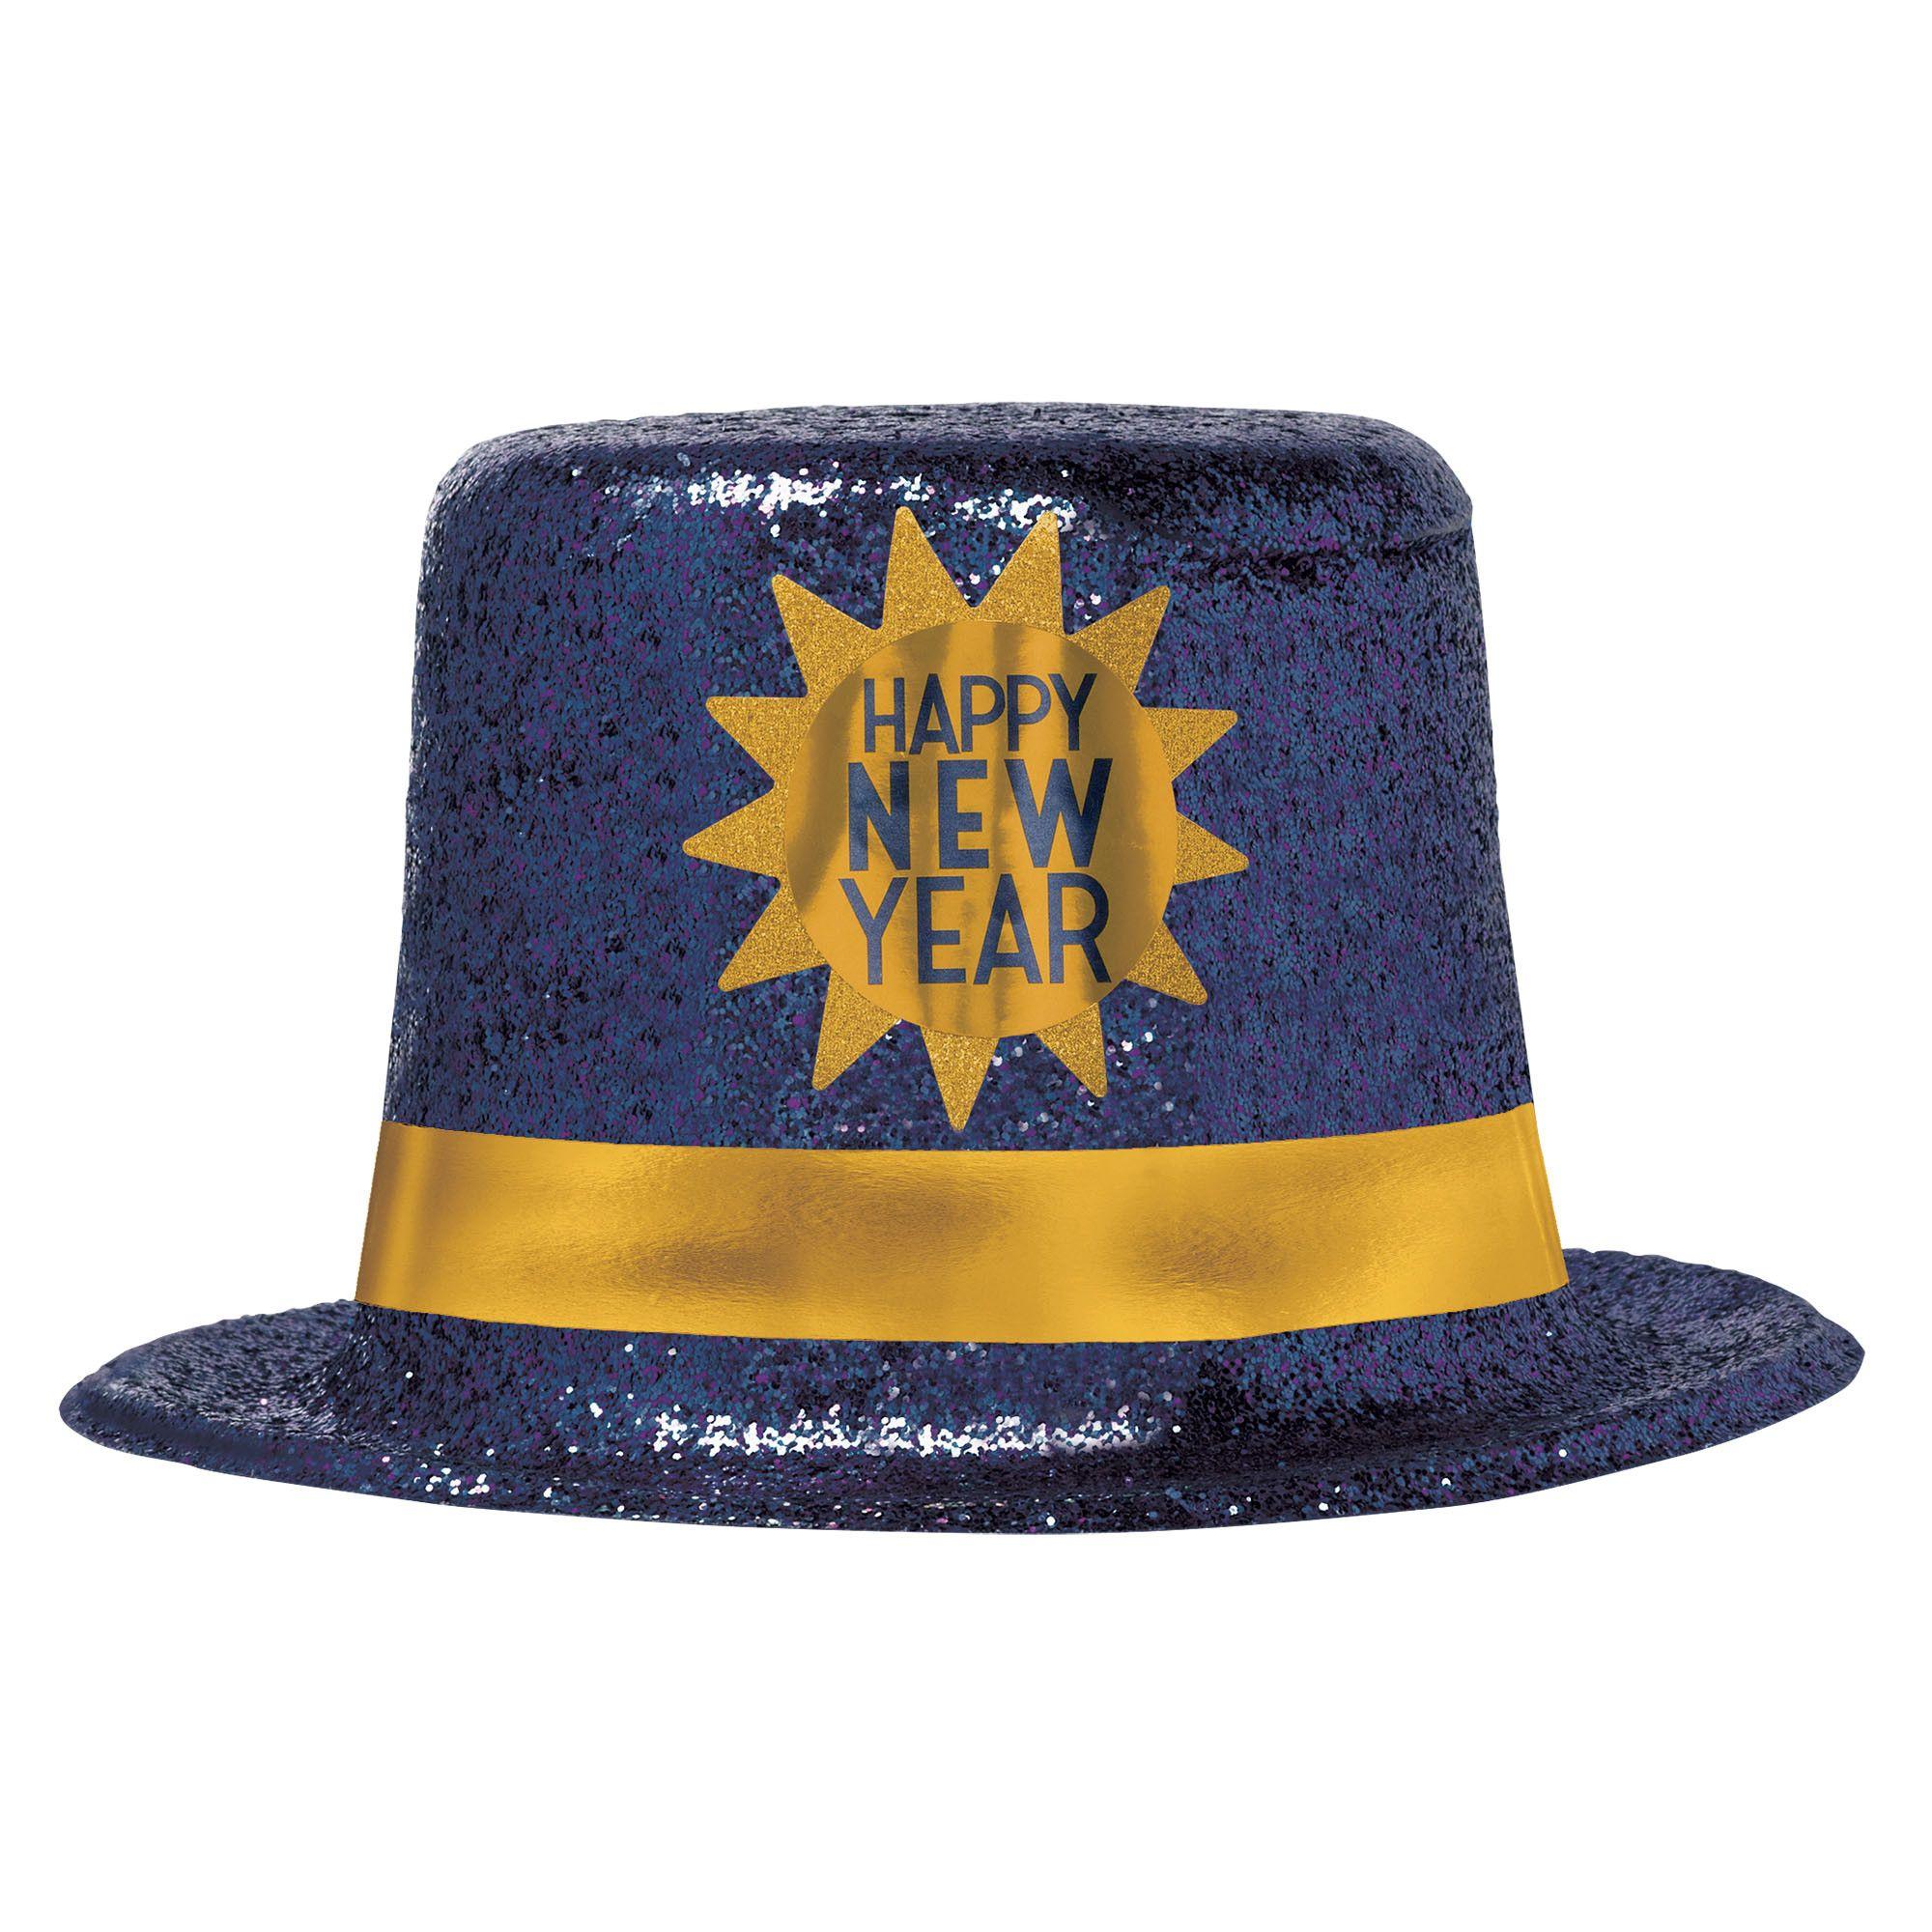 HNY Midnight Plastic Top Hat